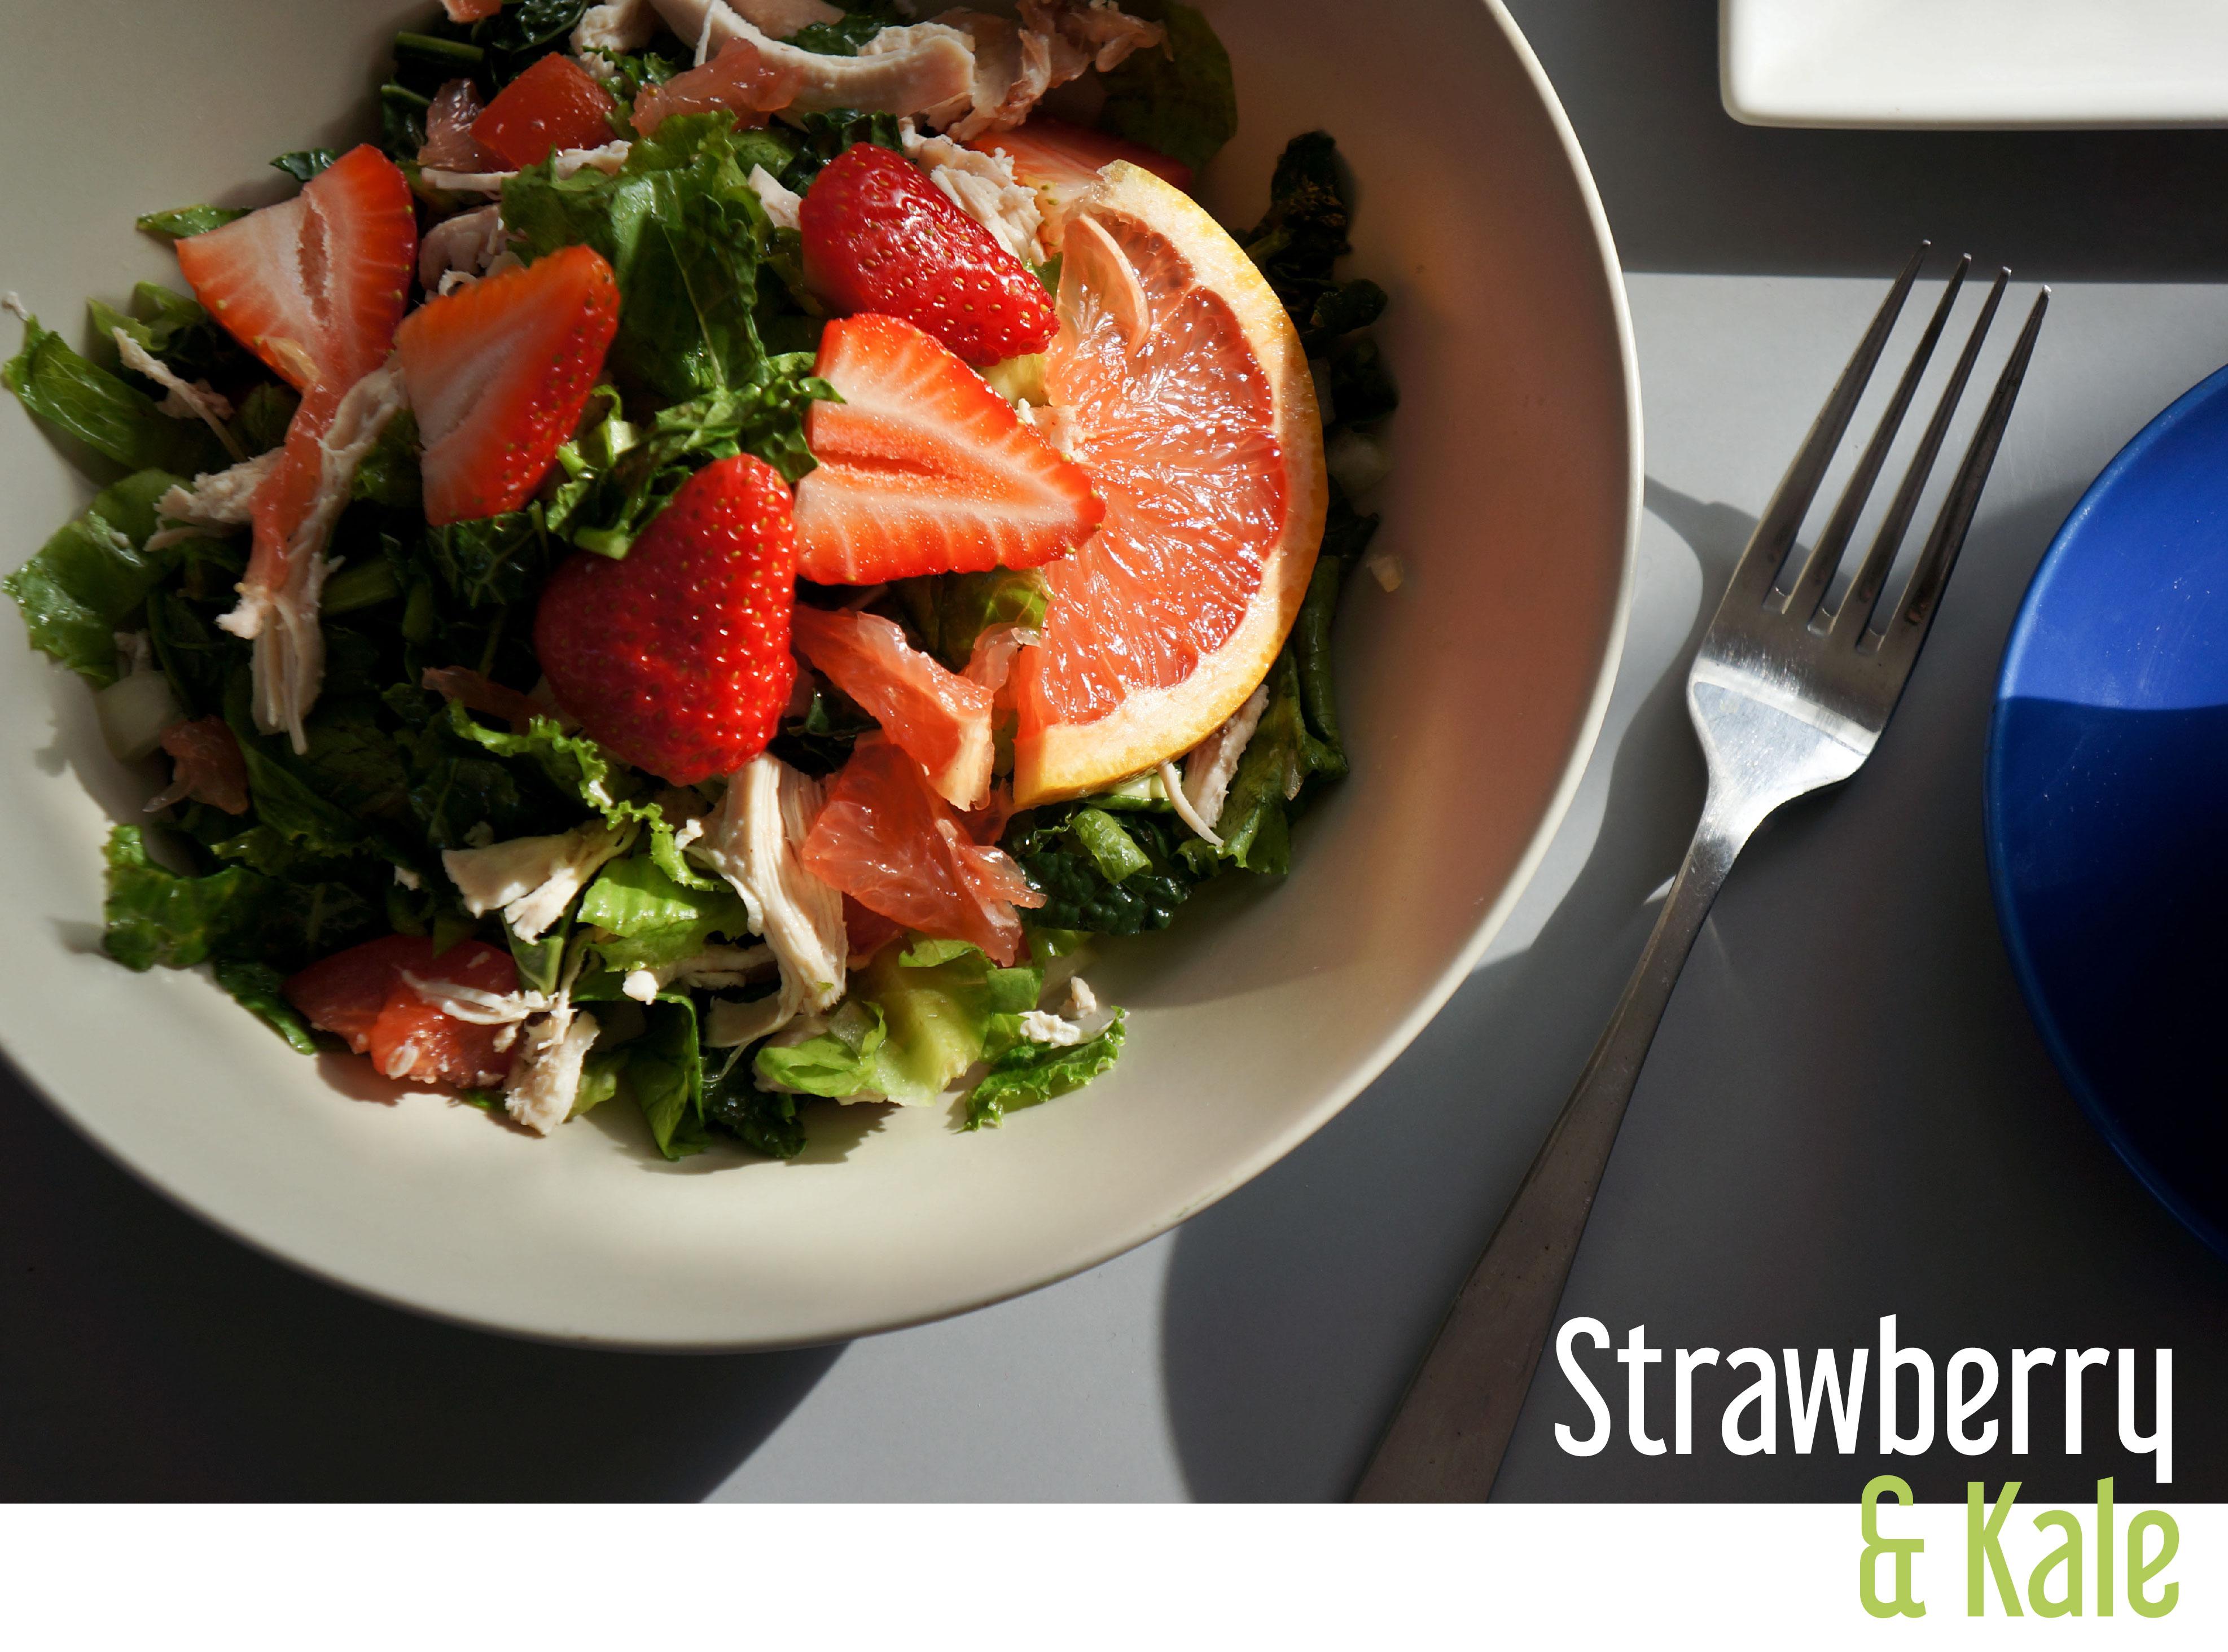 strawberrykale1